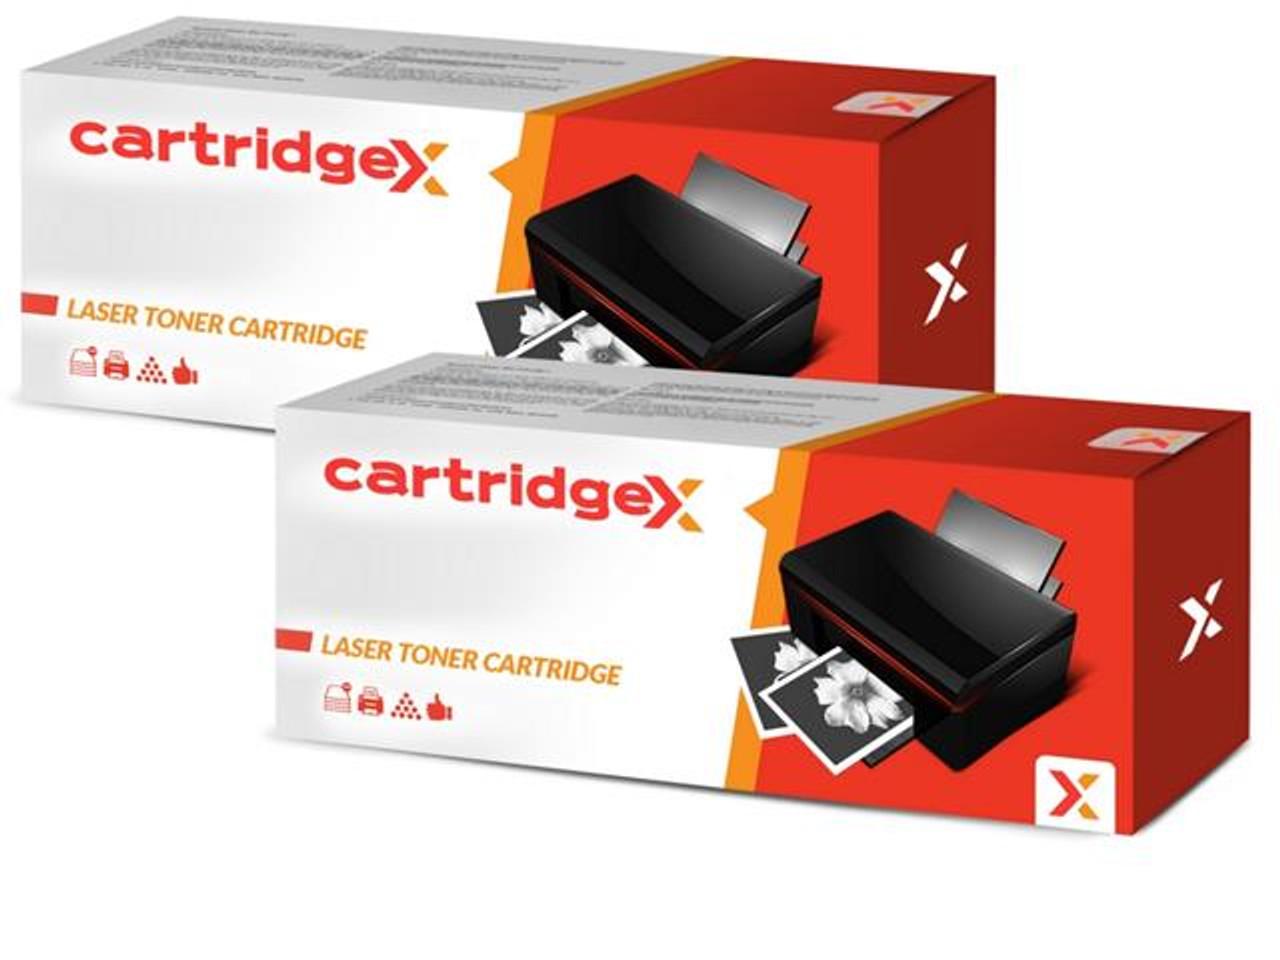 Compatible 2 X Black Toner Cartridge For Ricoh Sp 211su Sp 213sfnw Sp 213w Sp 201n